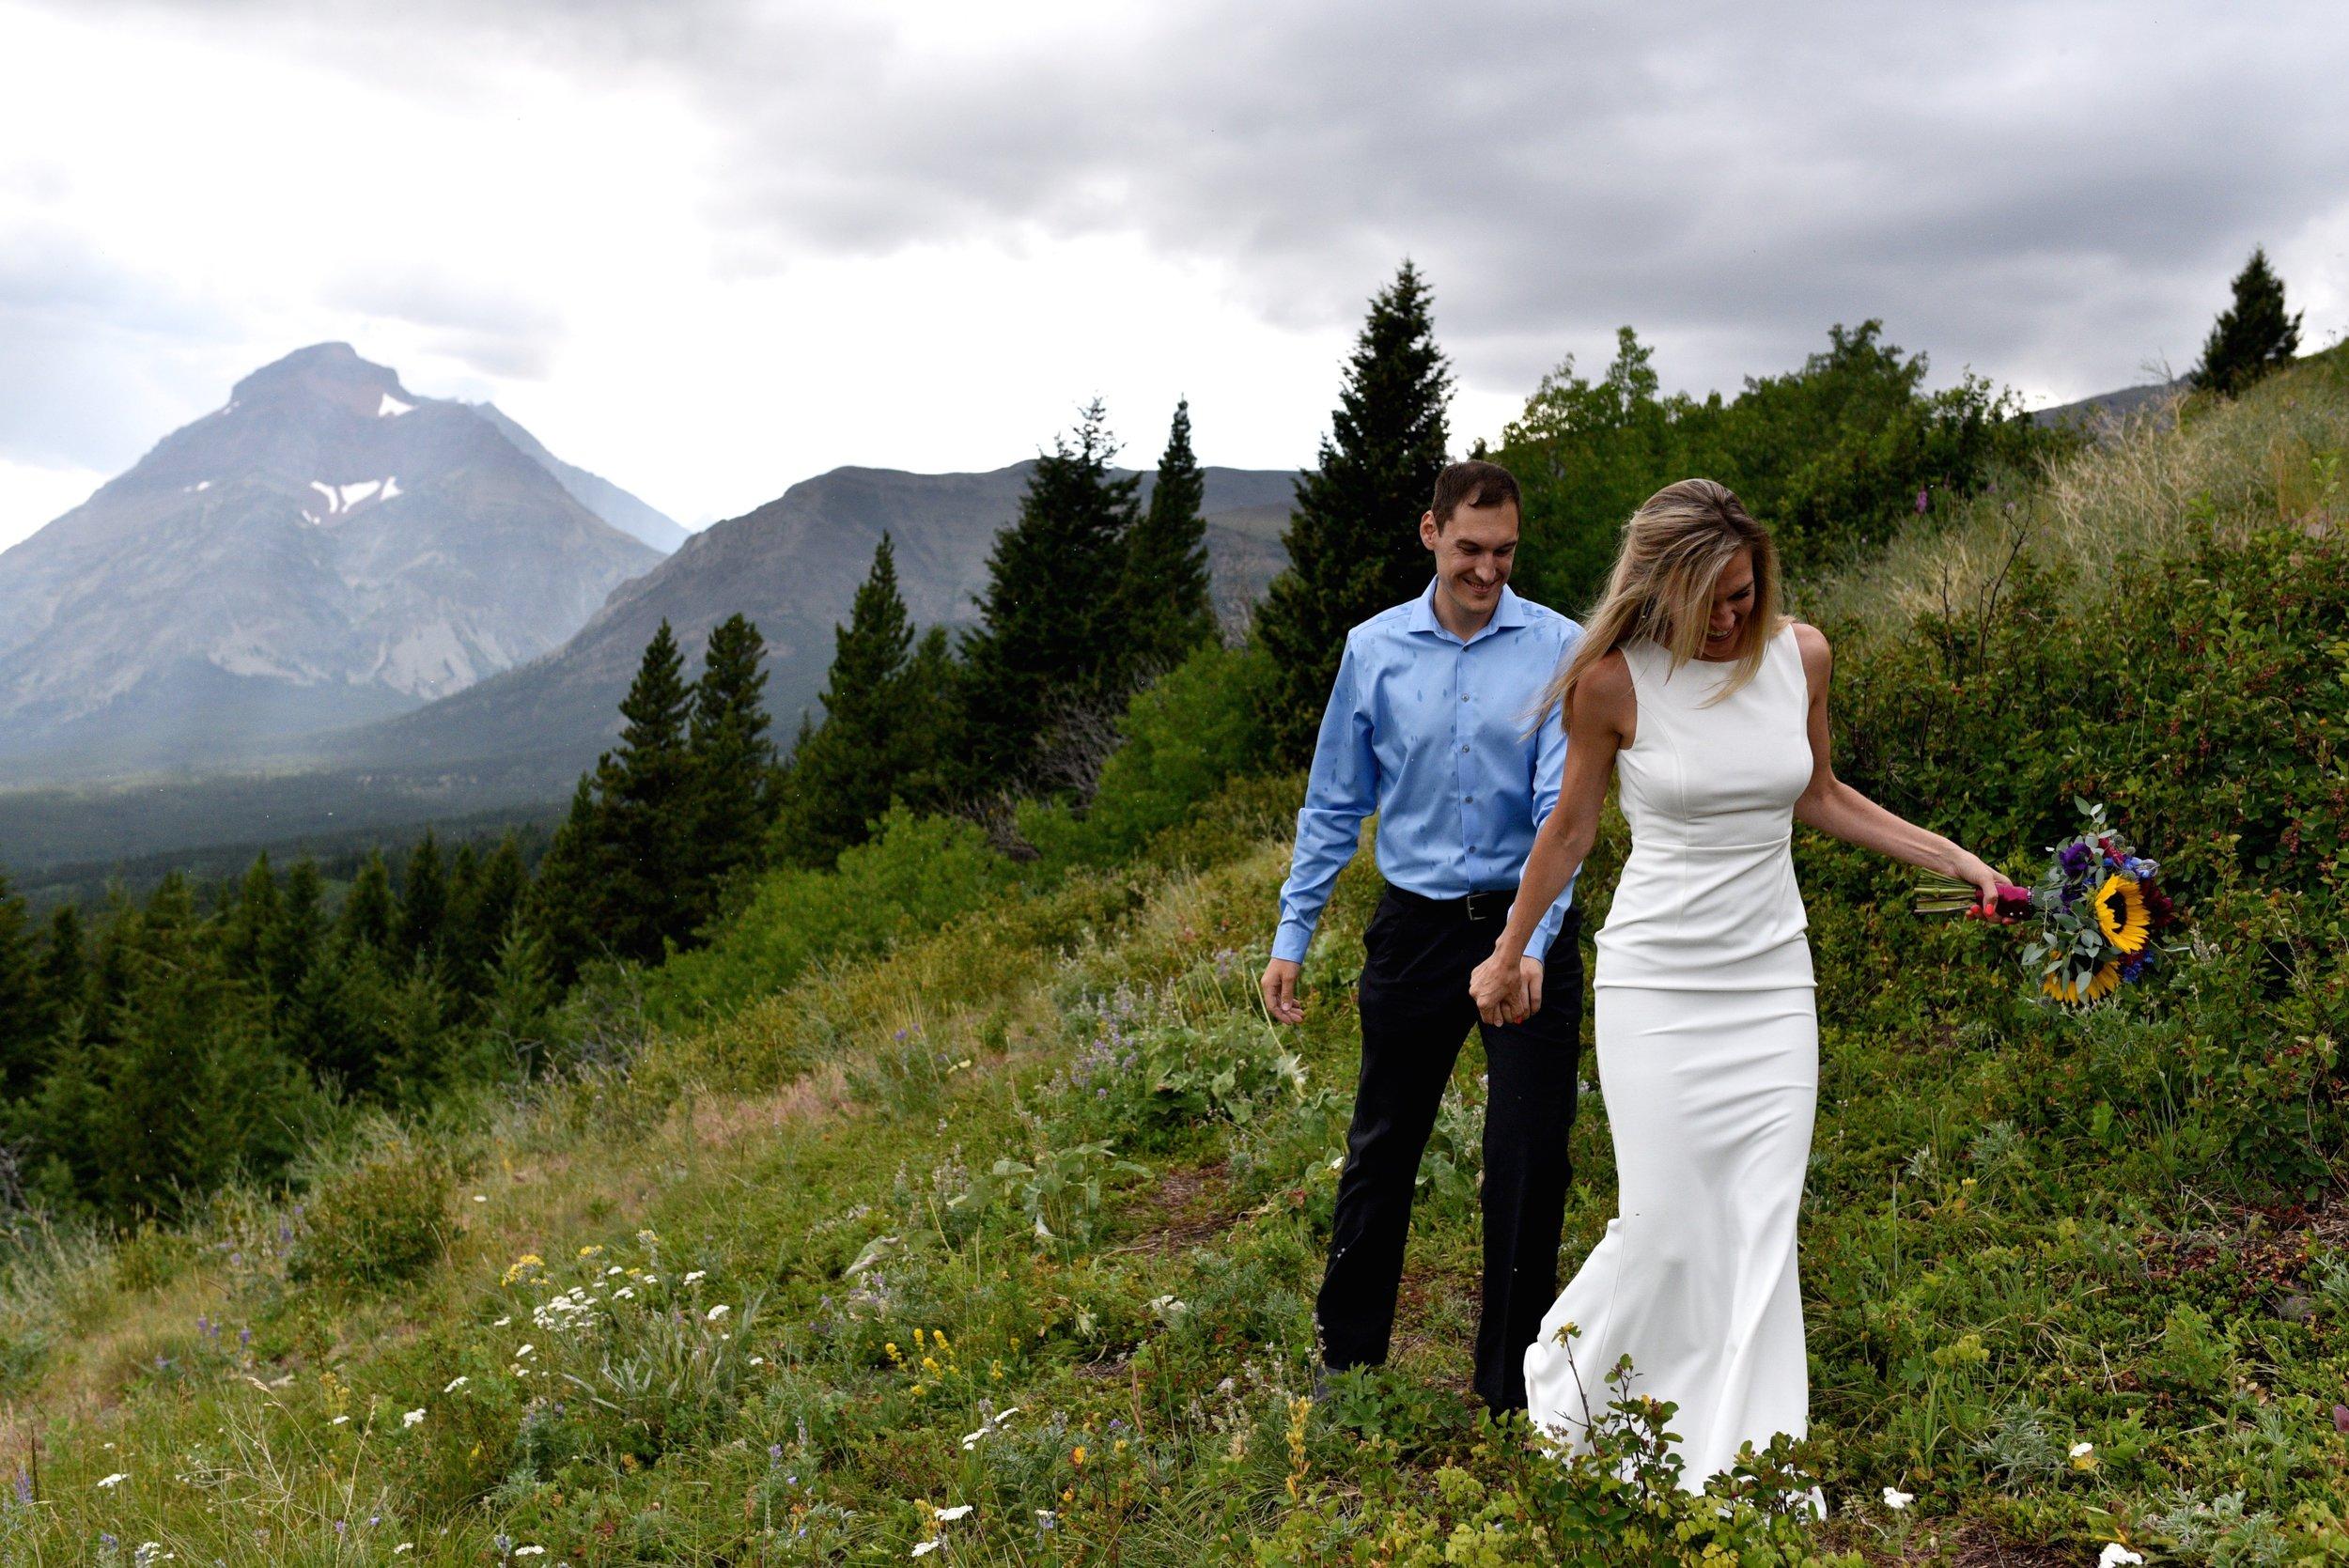 lindseyjane_elopement012.jpg